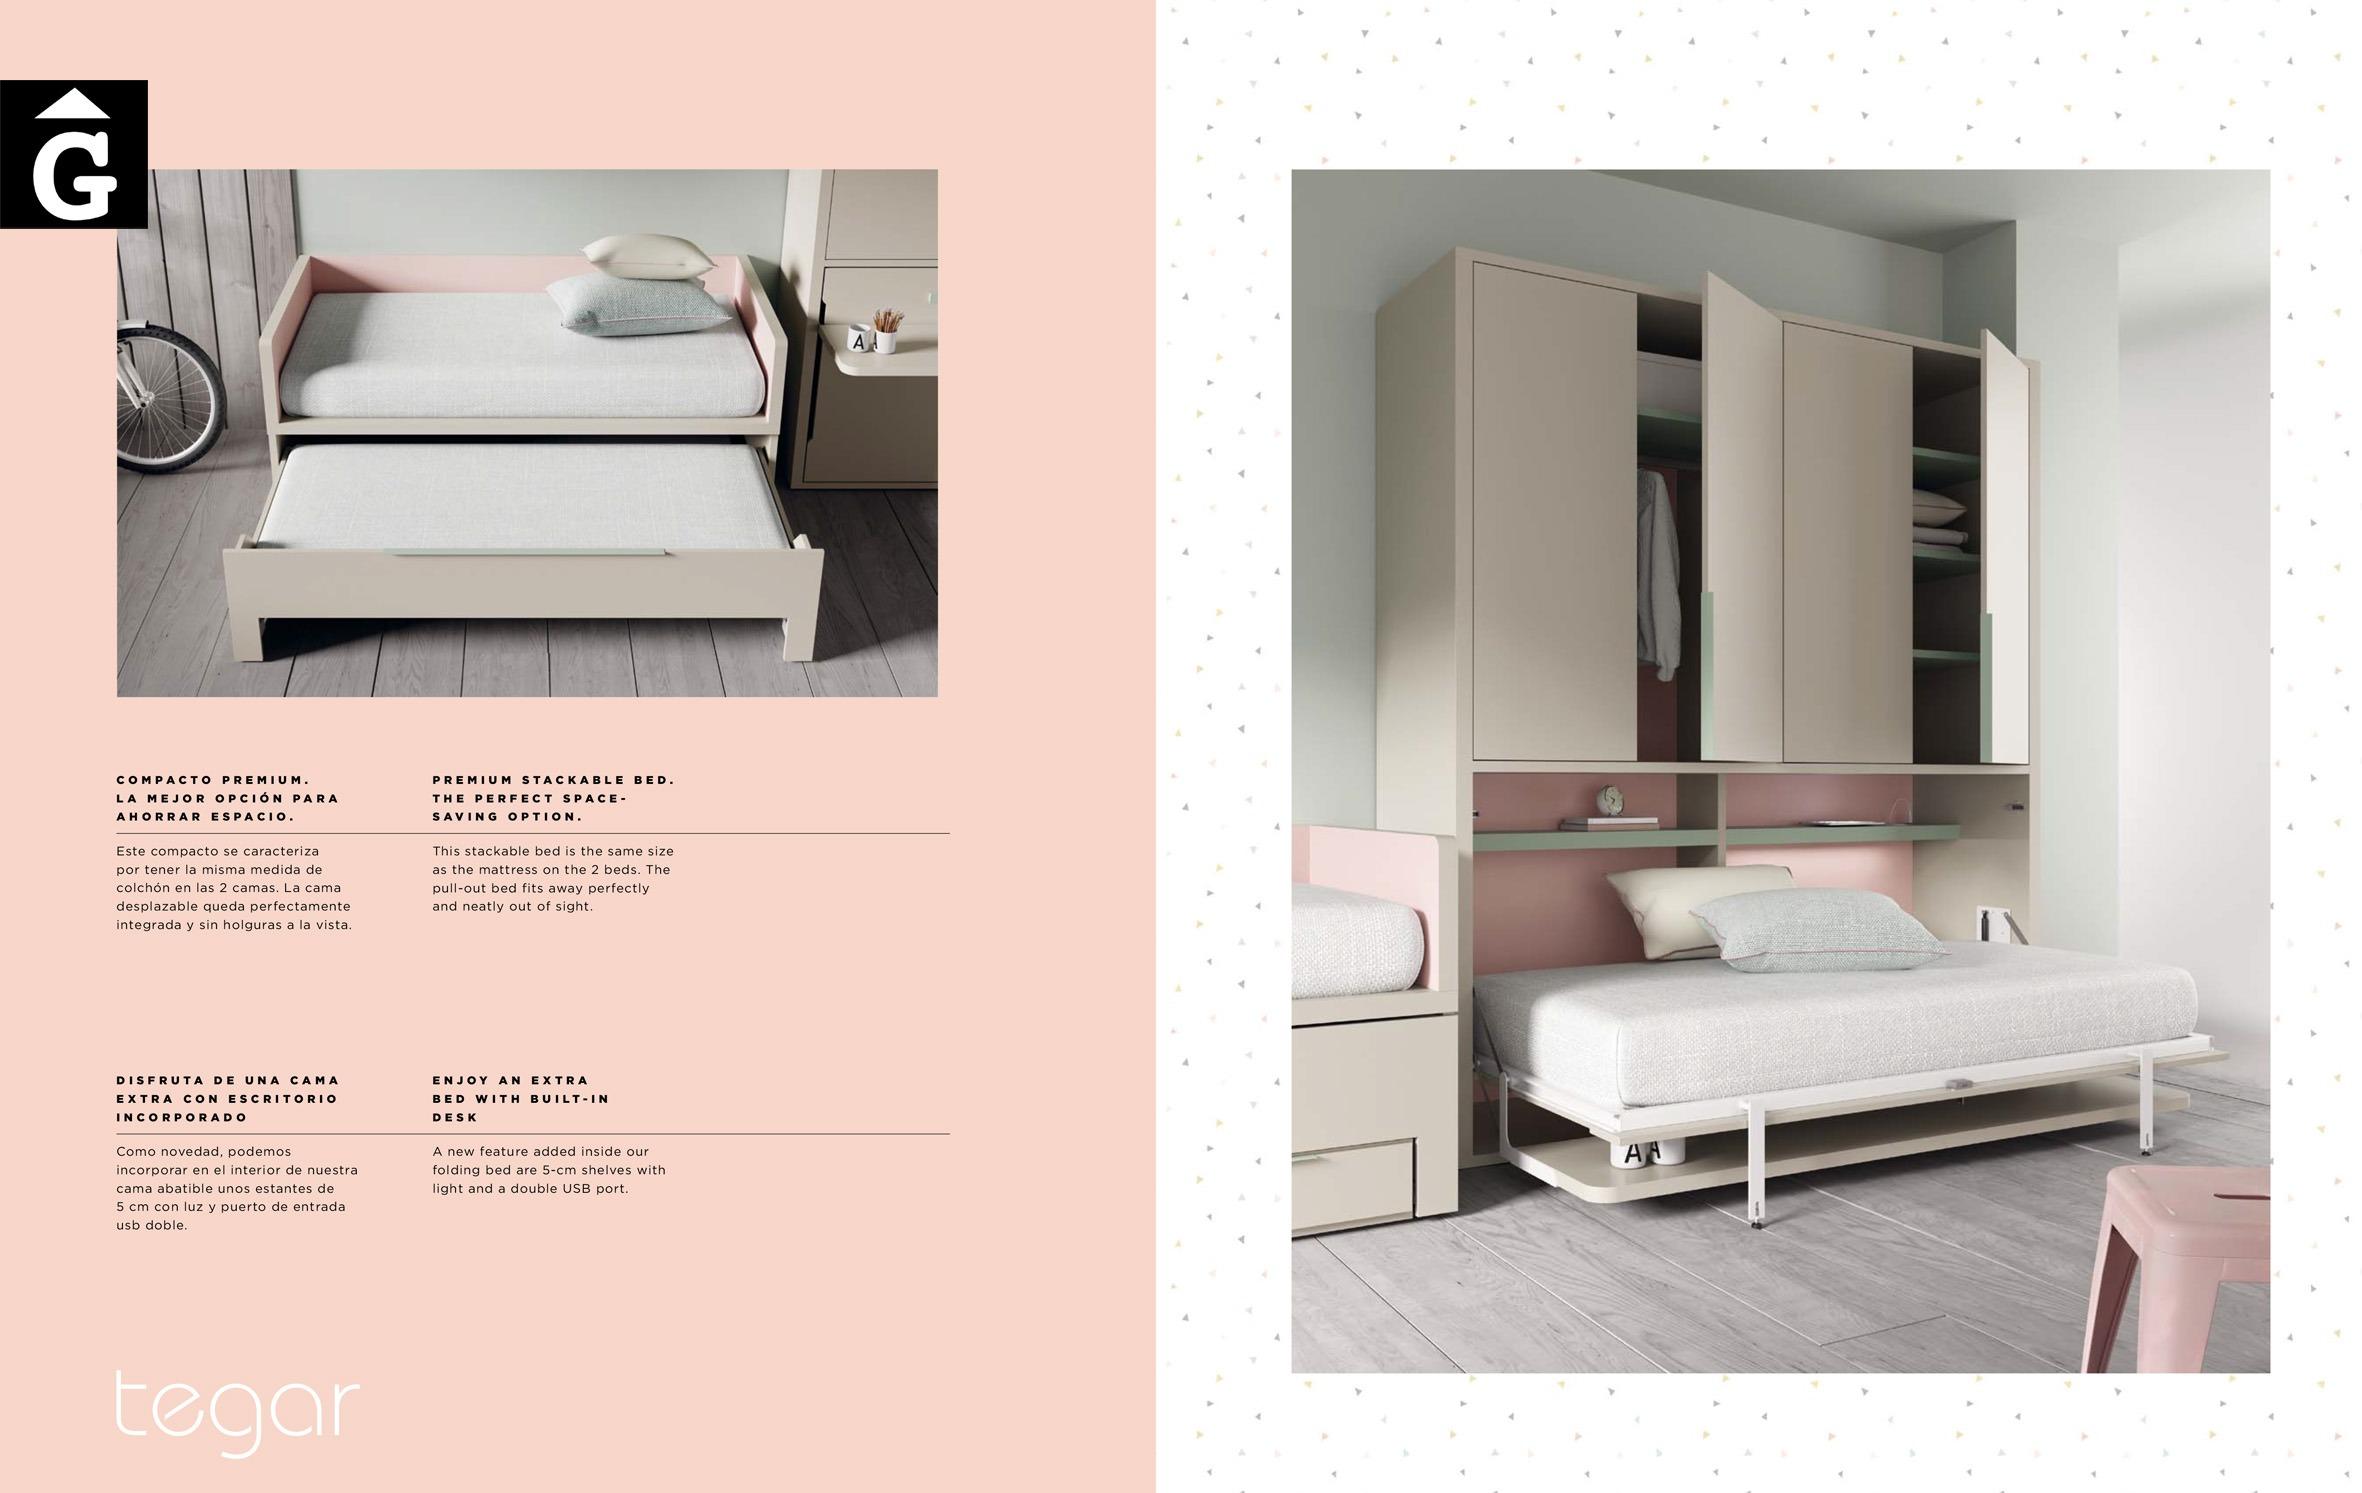 Llit i escriptori abatible amb llit lliscant QB NEXT Tegar by nobles GIFREU Girona modern minim elegant atemporal